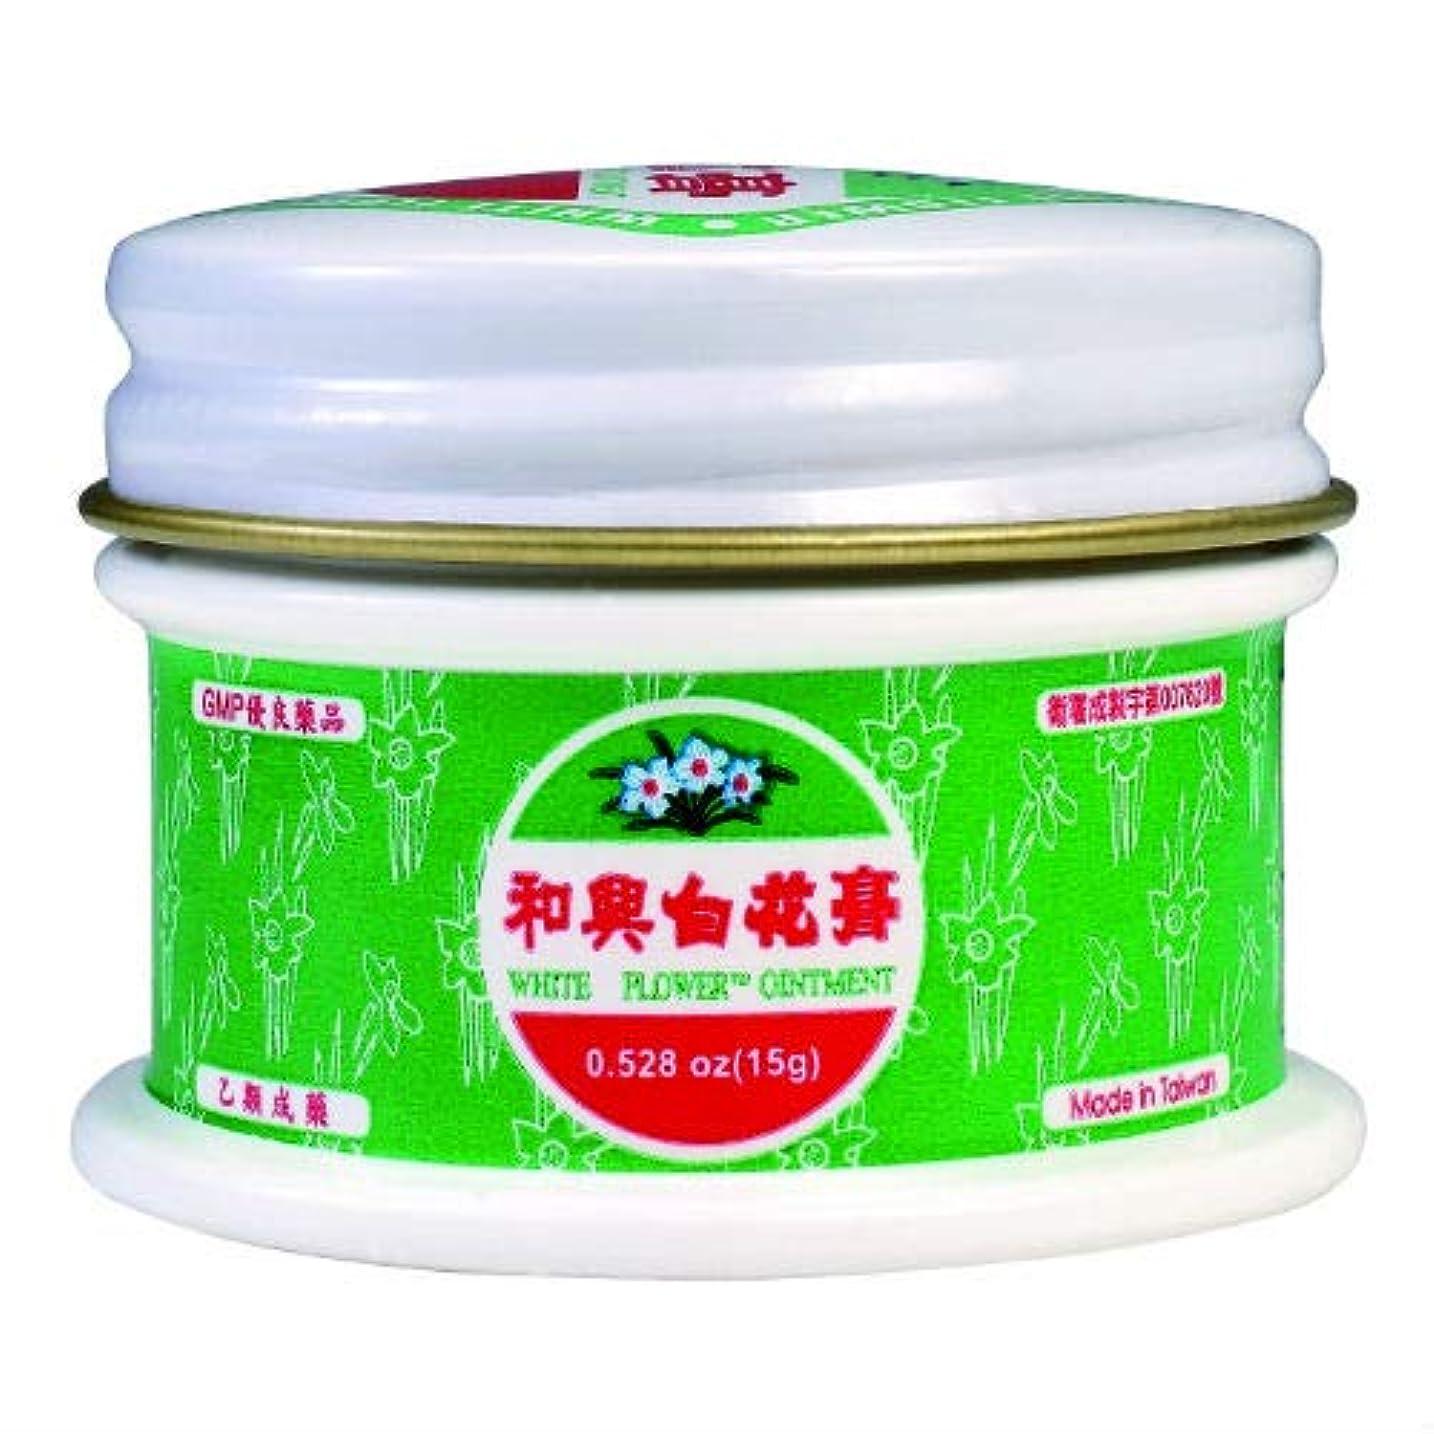 奴隷皮肉な類推台湾 純正版 白花膏 15g( 白花油軟膏タイプ )